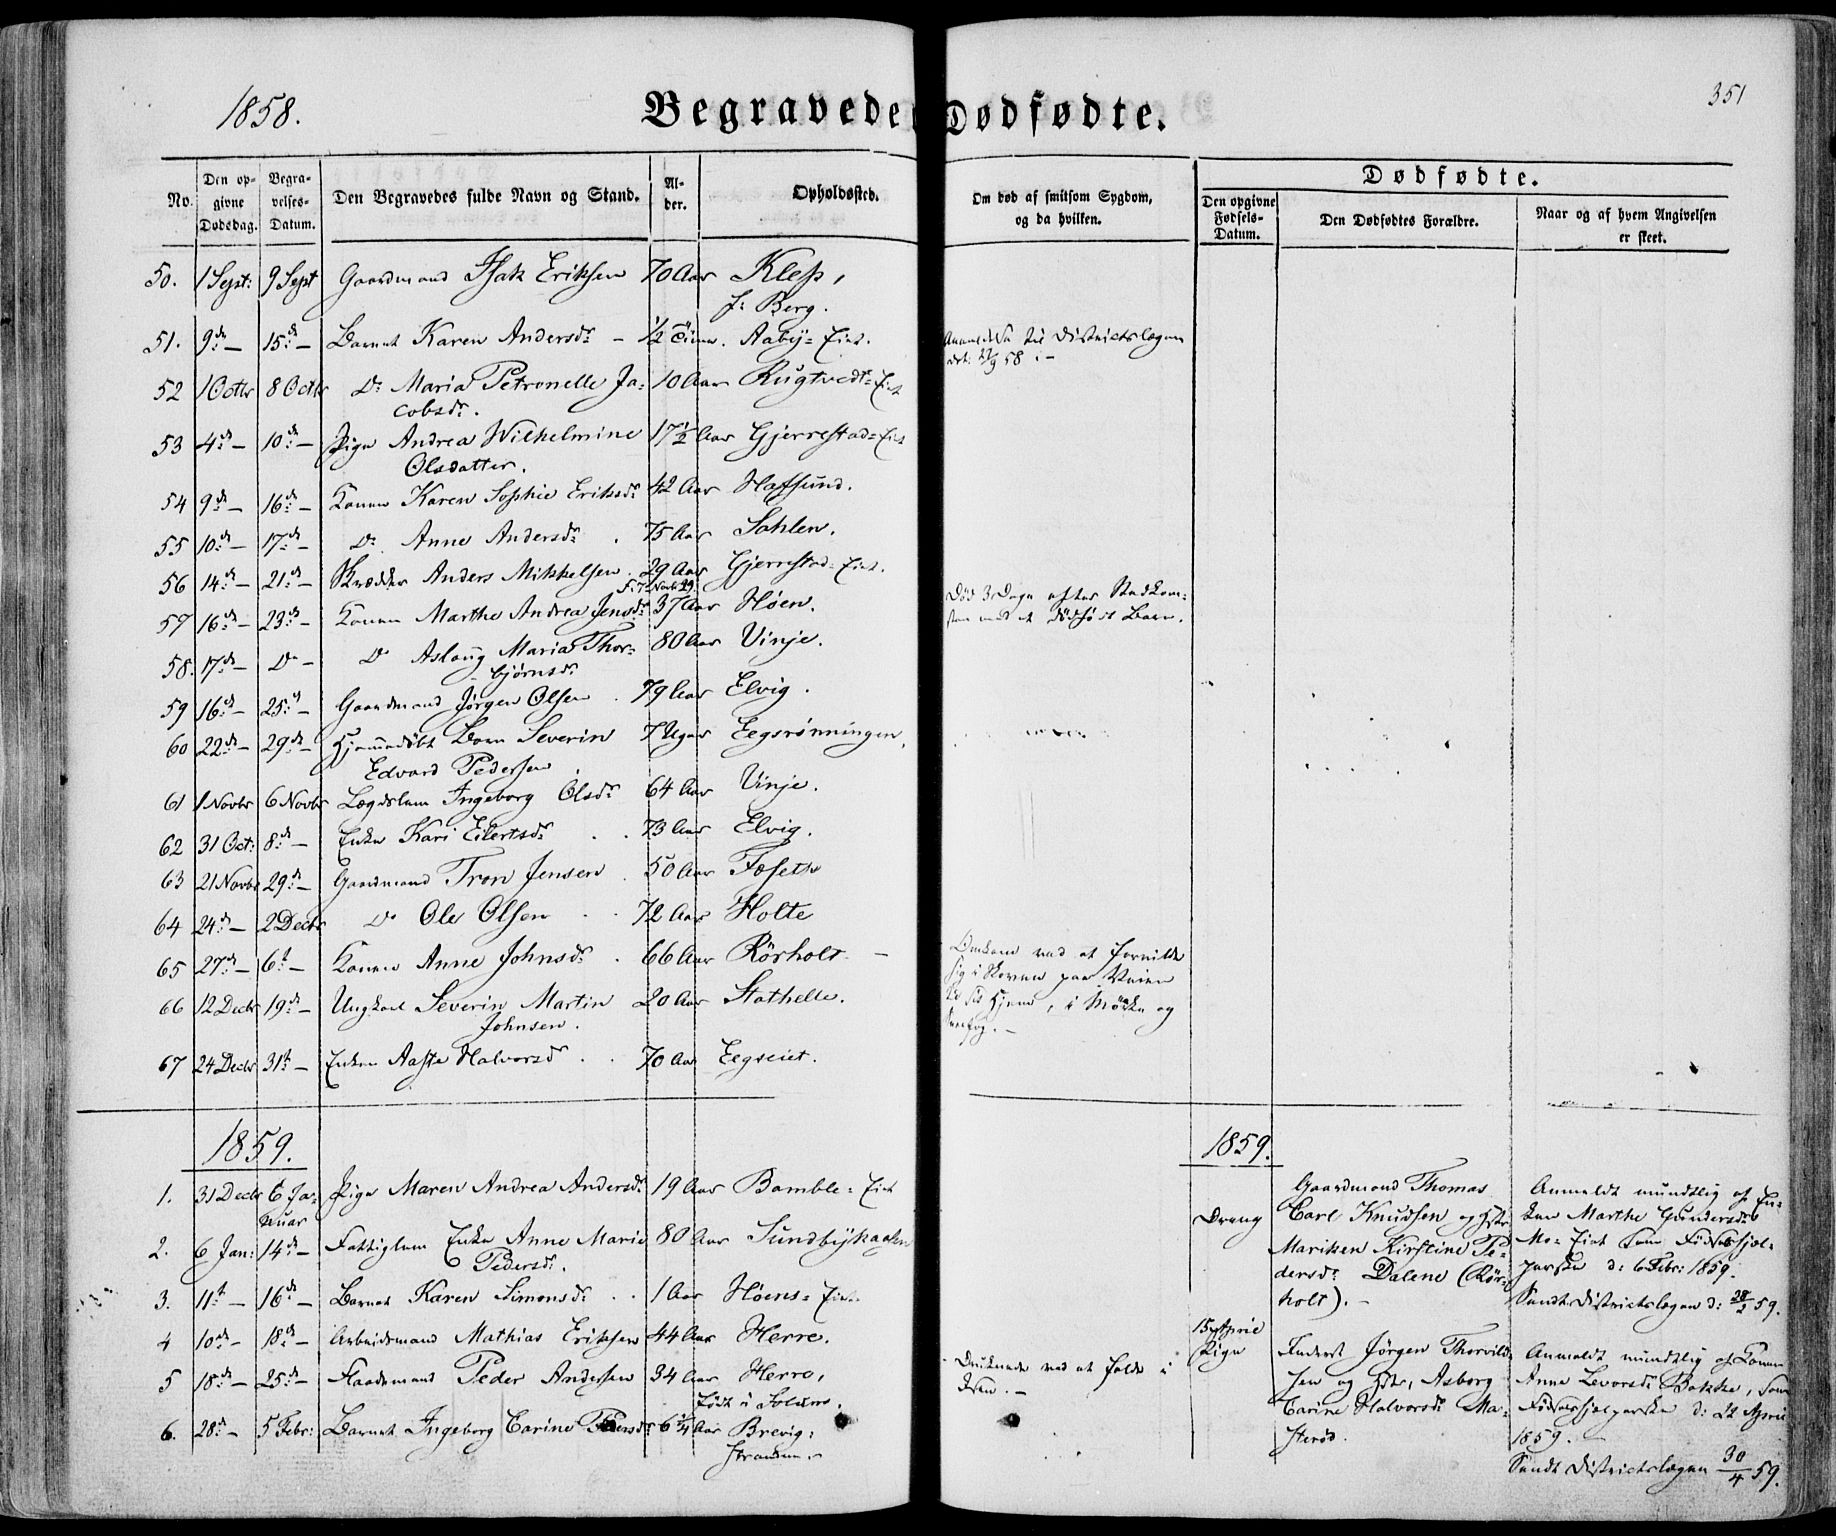 SAKO, Bamble kirkebøker, F/Fa/L0005: Ministerialbok nr. I 5, 1854-1869, s. 351